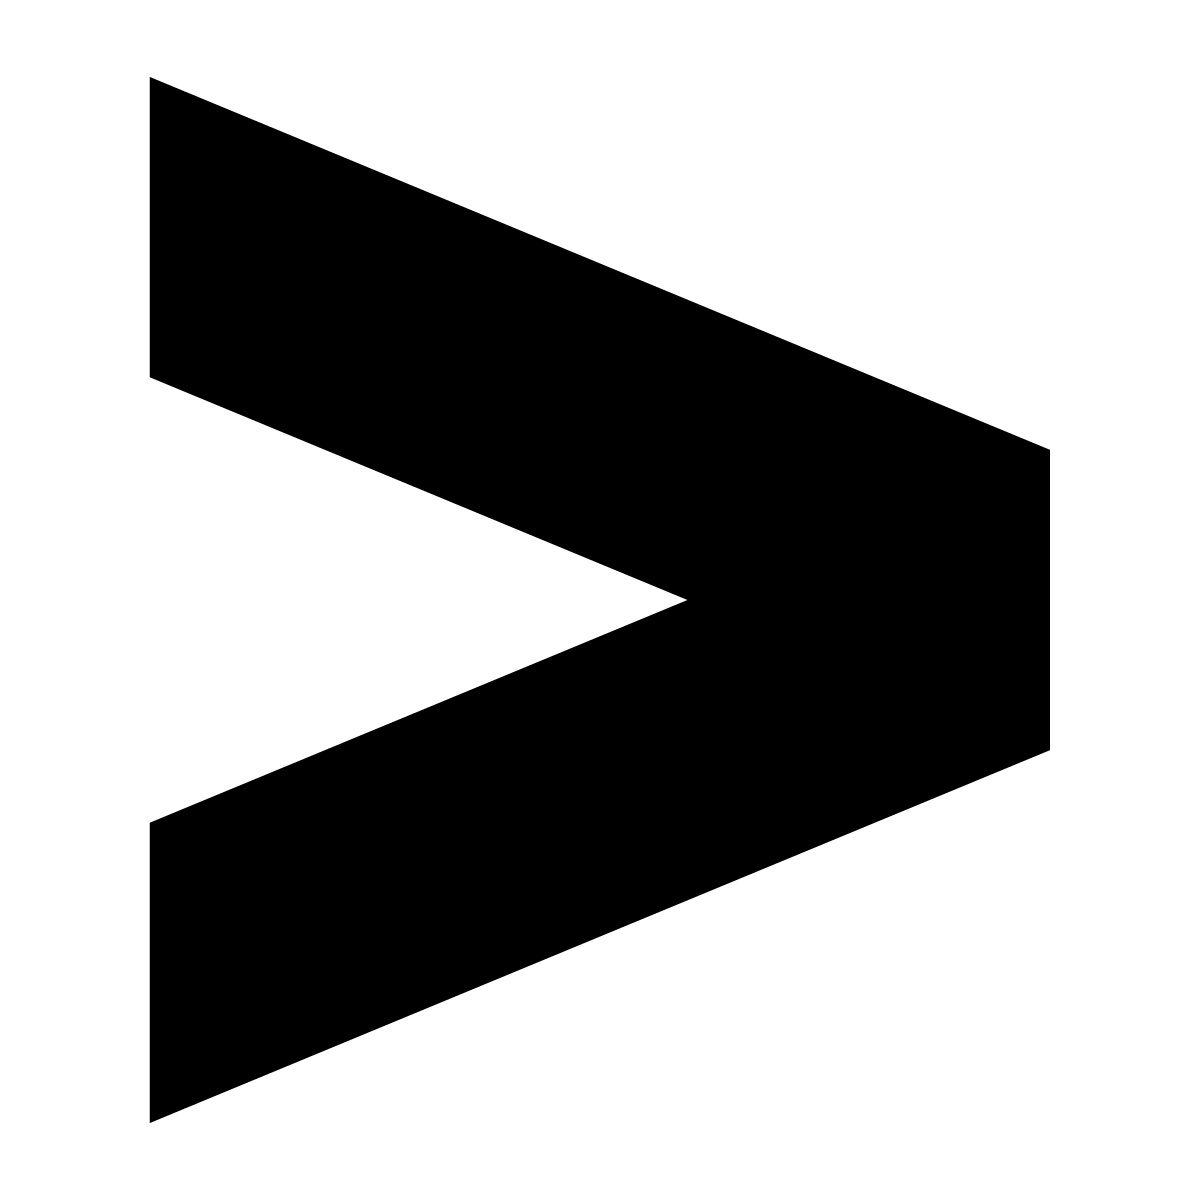 Source httpabcteachdocumentsclip art math symbols clip art math symbols greater than or equal to sign color love it buycottarizona Images